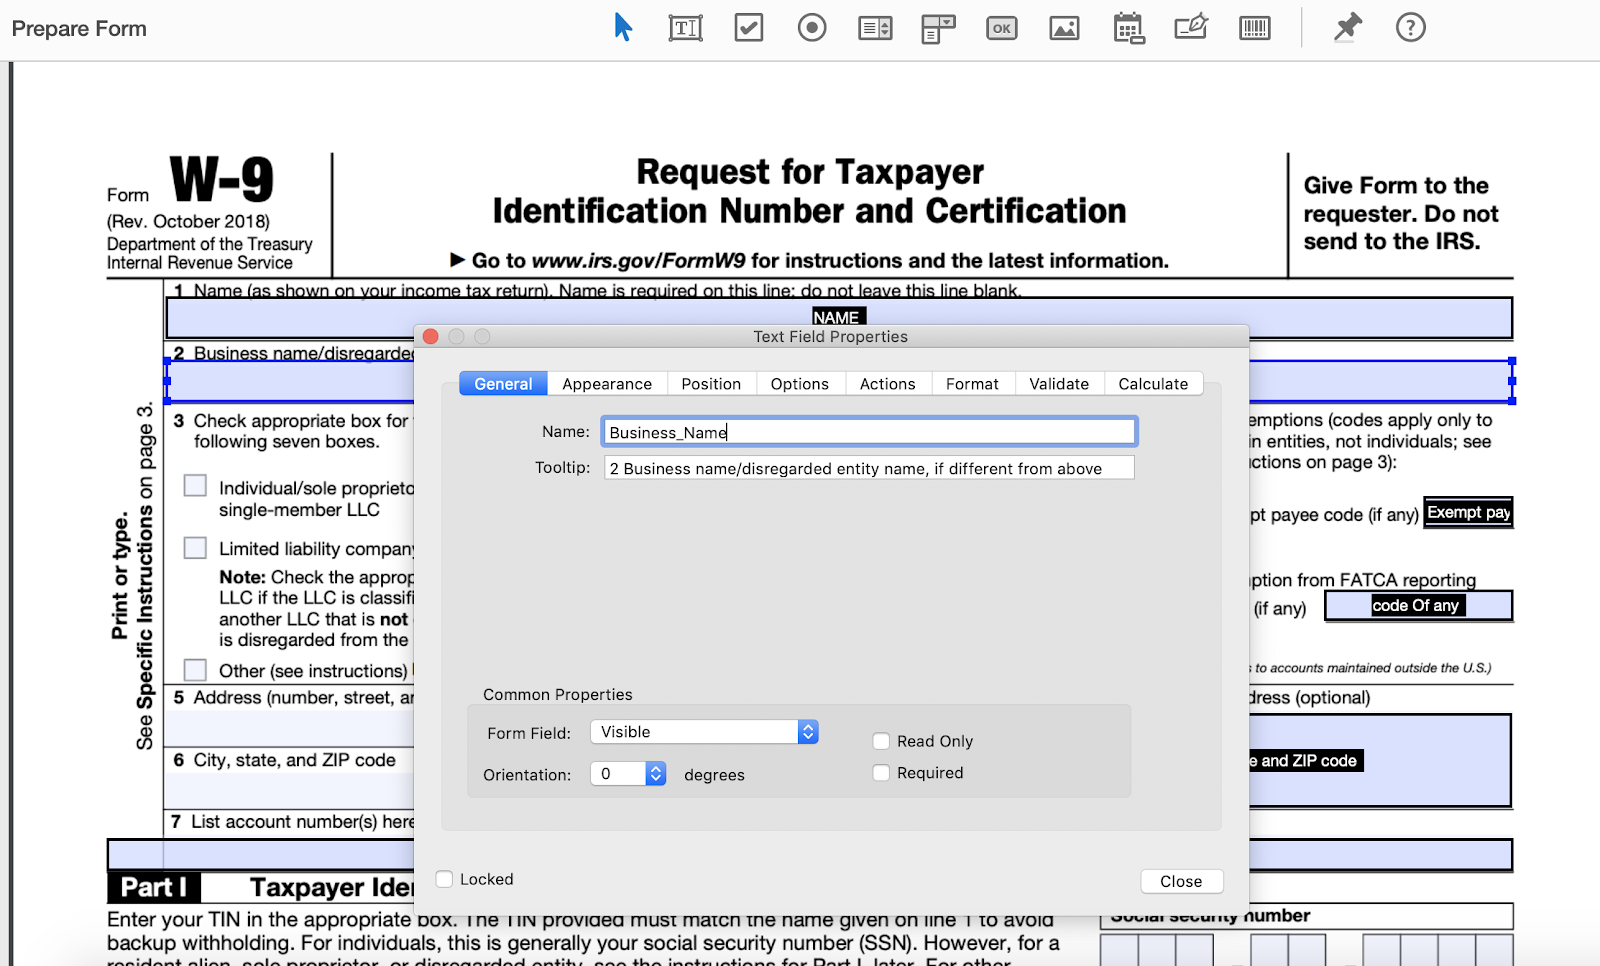 Adobe PDF Prepare Form